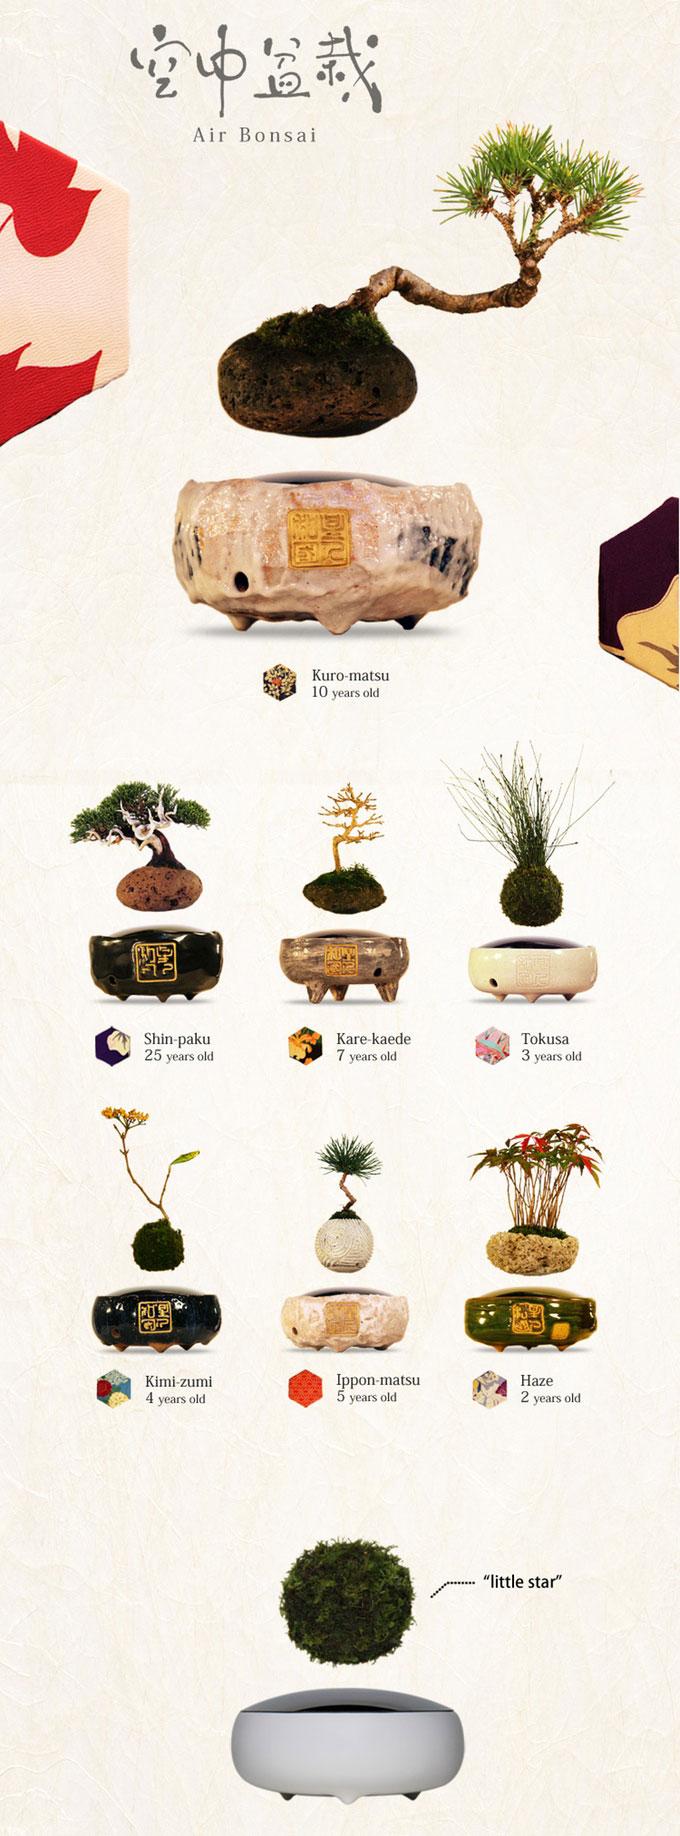 floating air bonsai by hoshinchu on kickstarter (2)